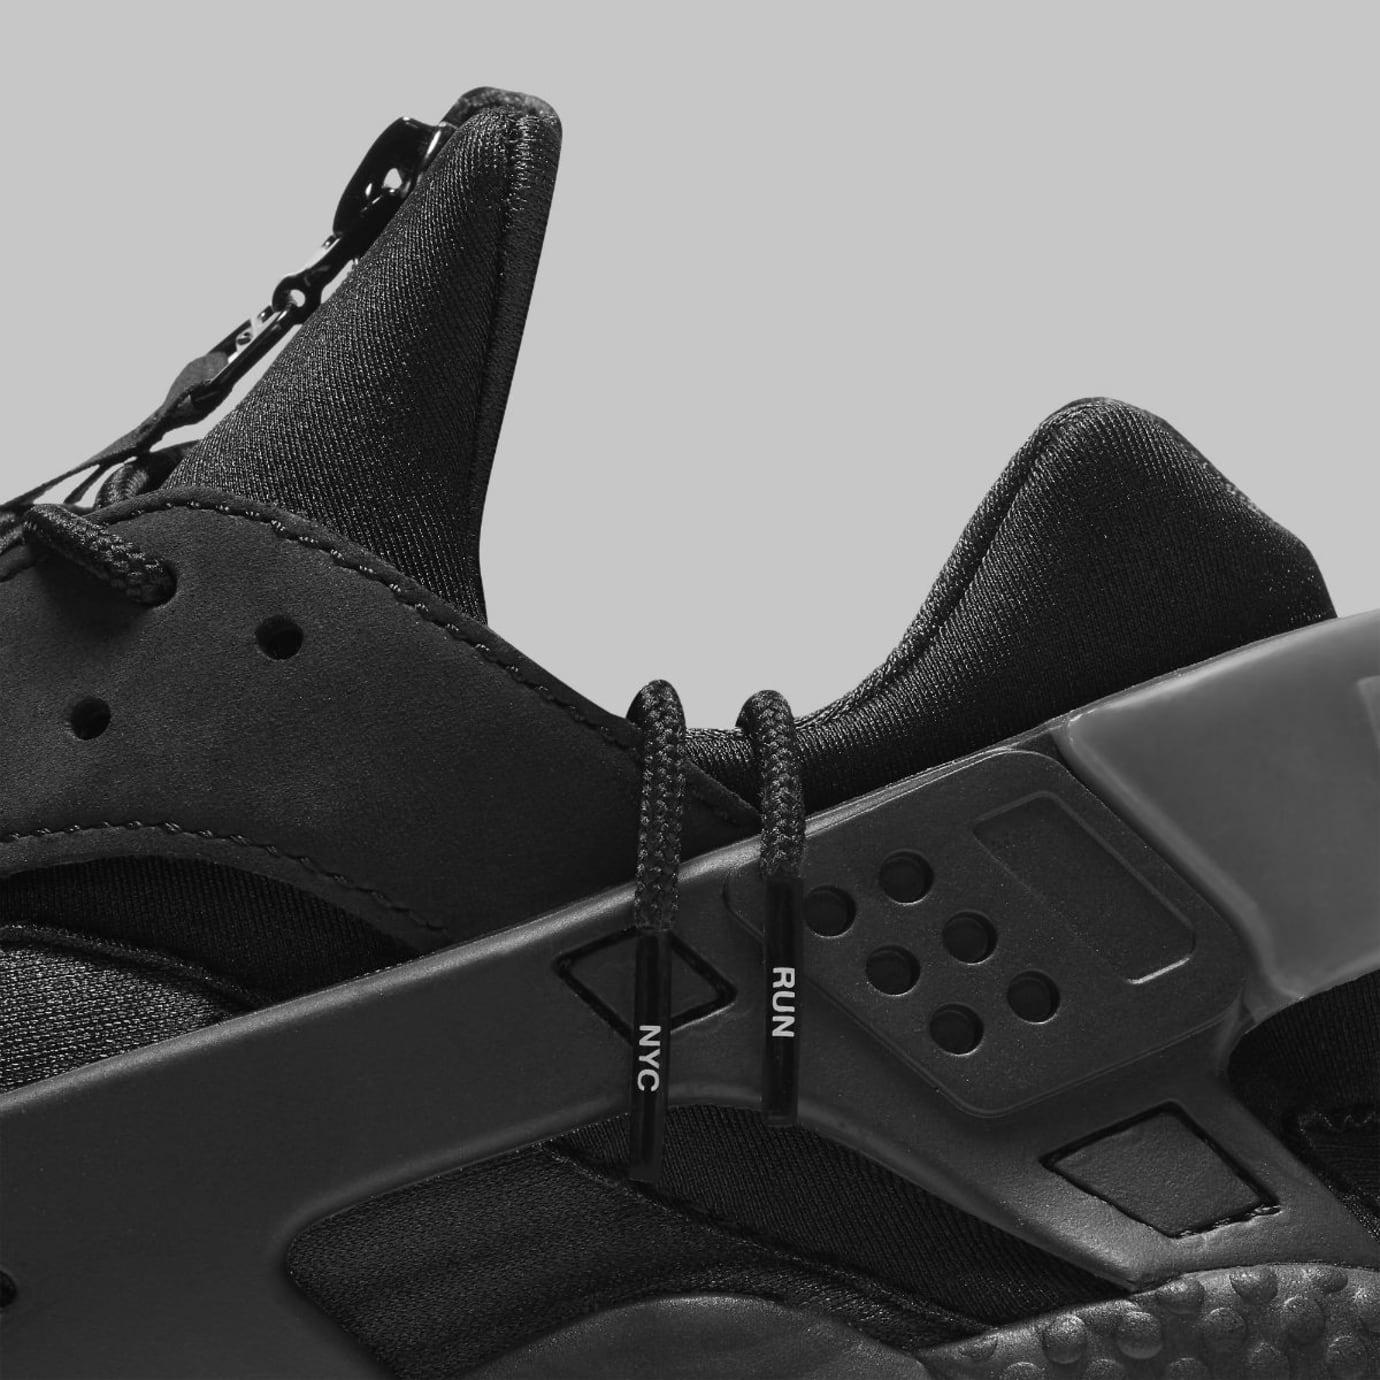 Nike Air Huarache Run NYC Triple Black Release Date AJ5578-001 Laces